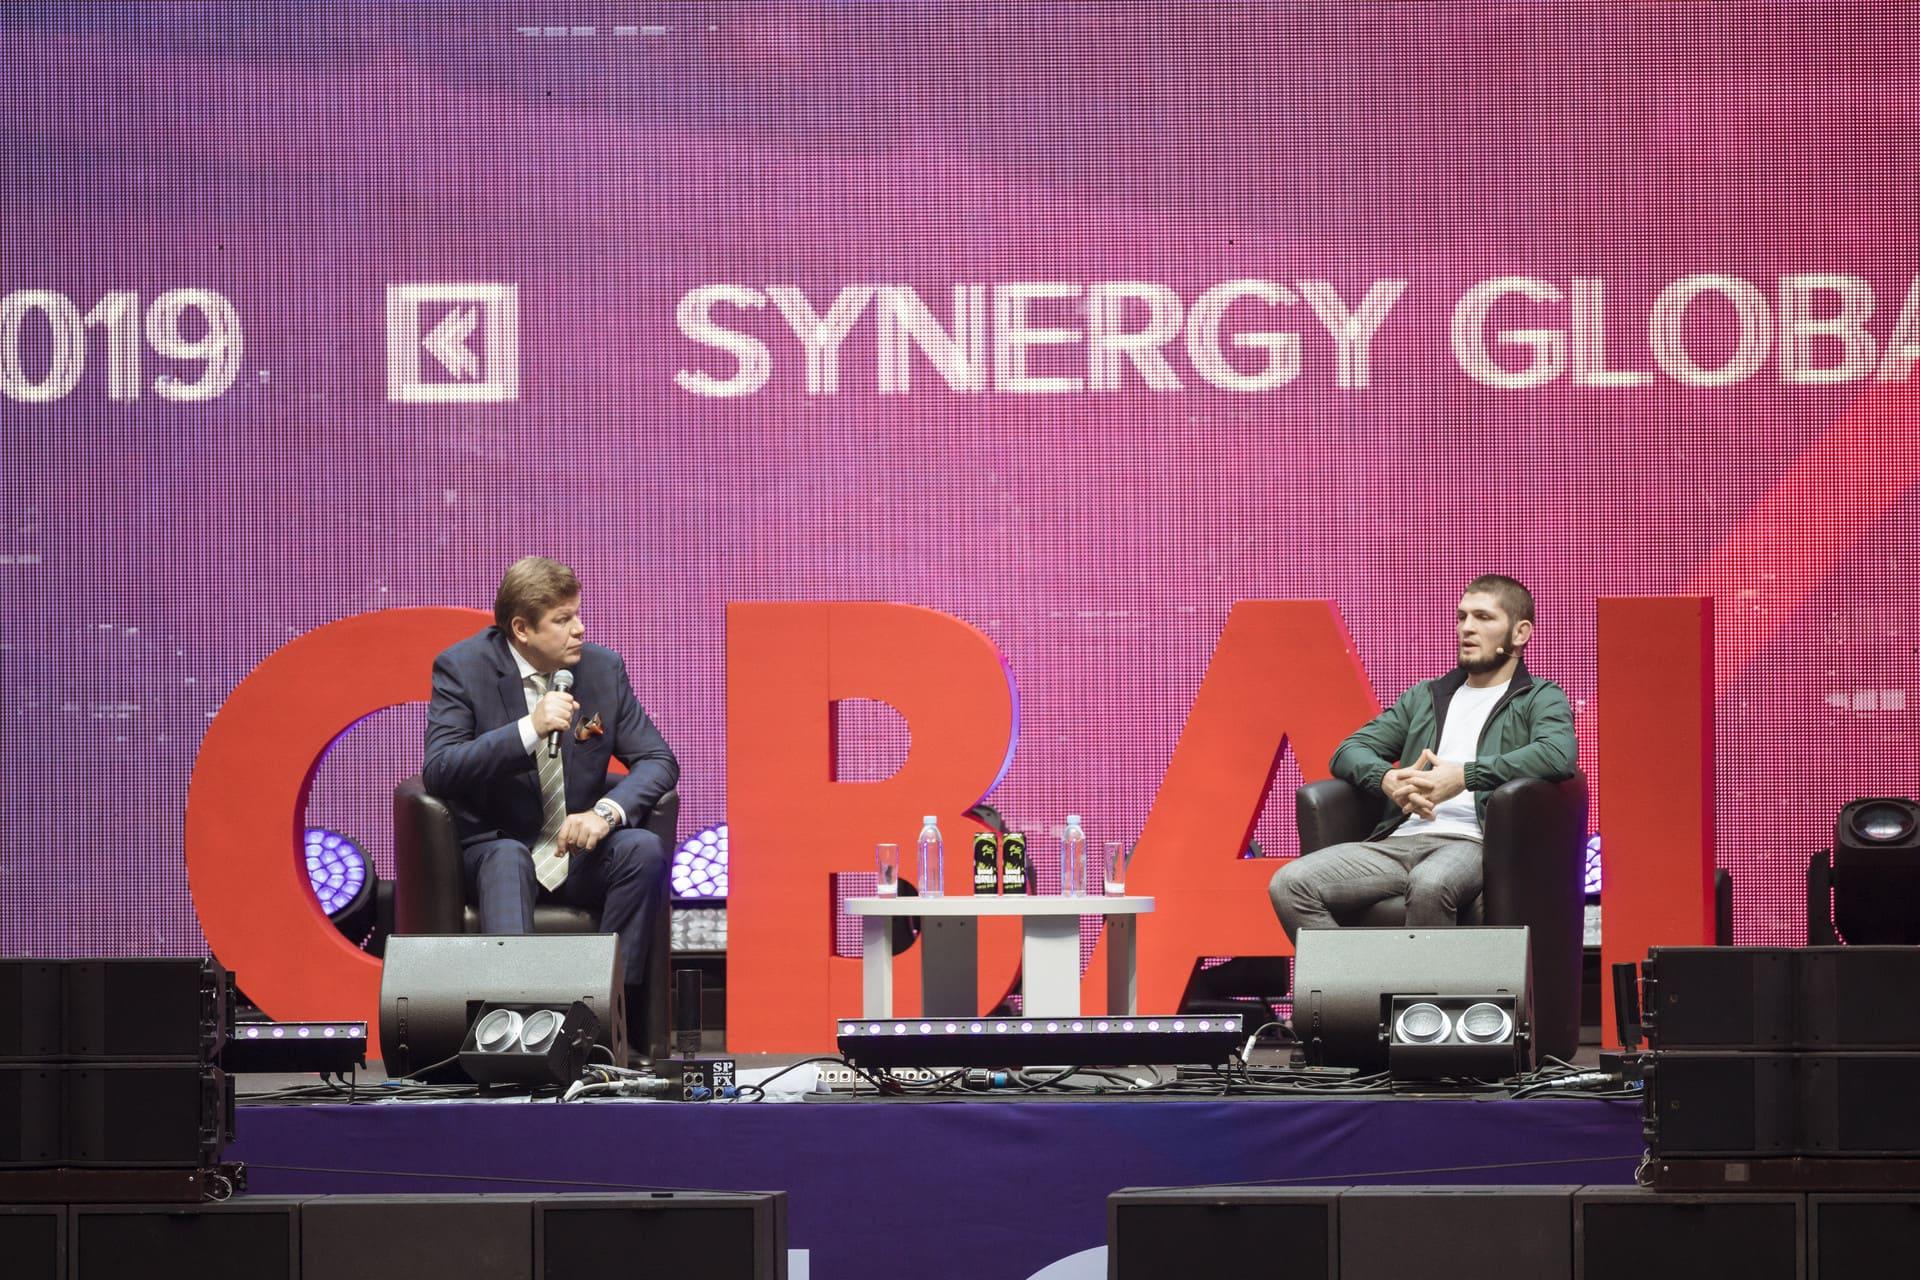 Хабиб Нурмагомедов на Synergy Global Forum дал интервью Дмитрию Губерниеву